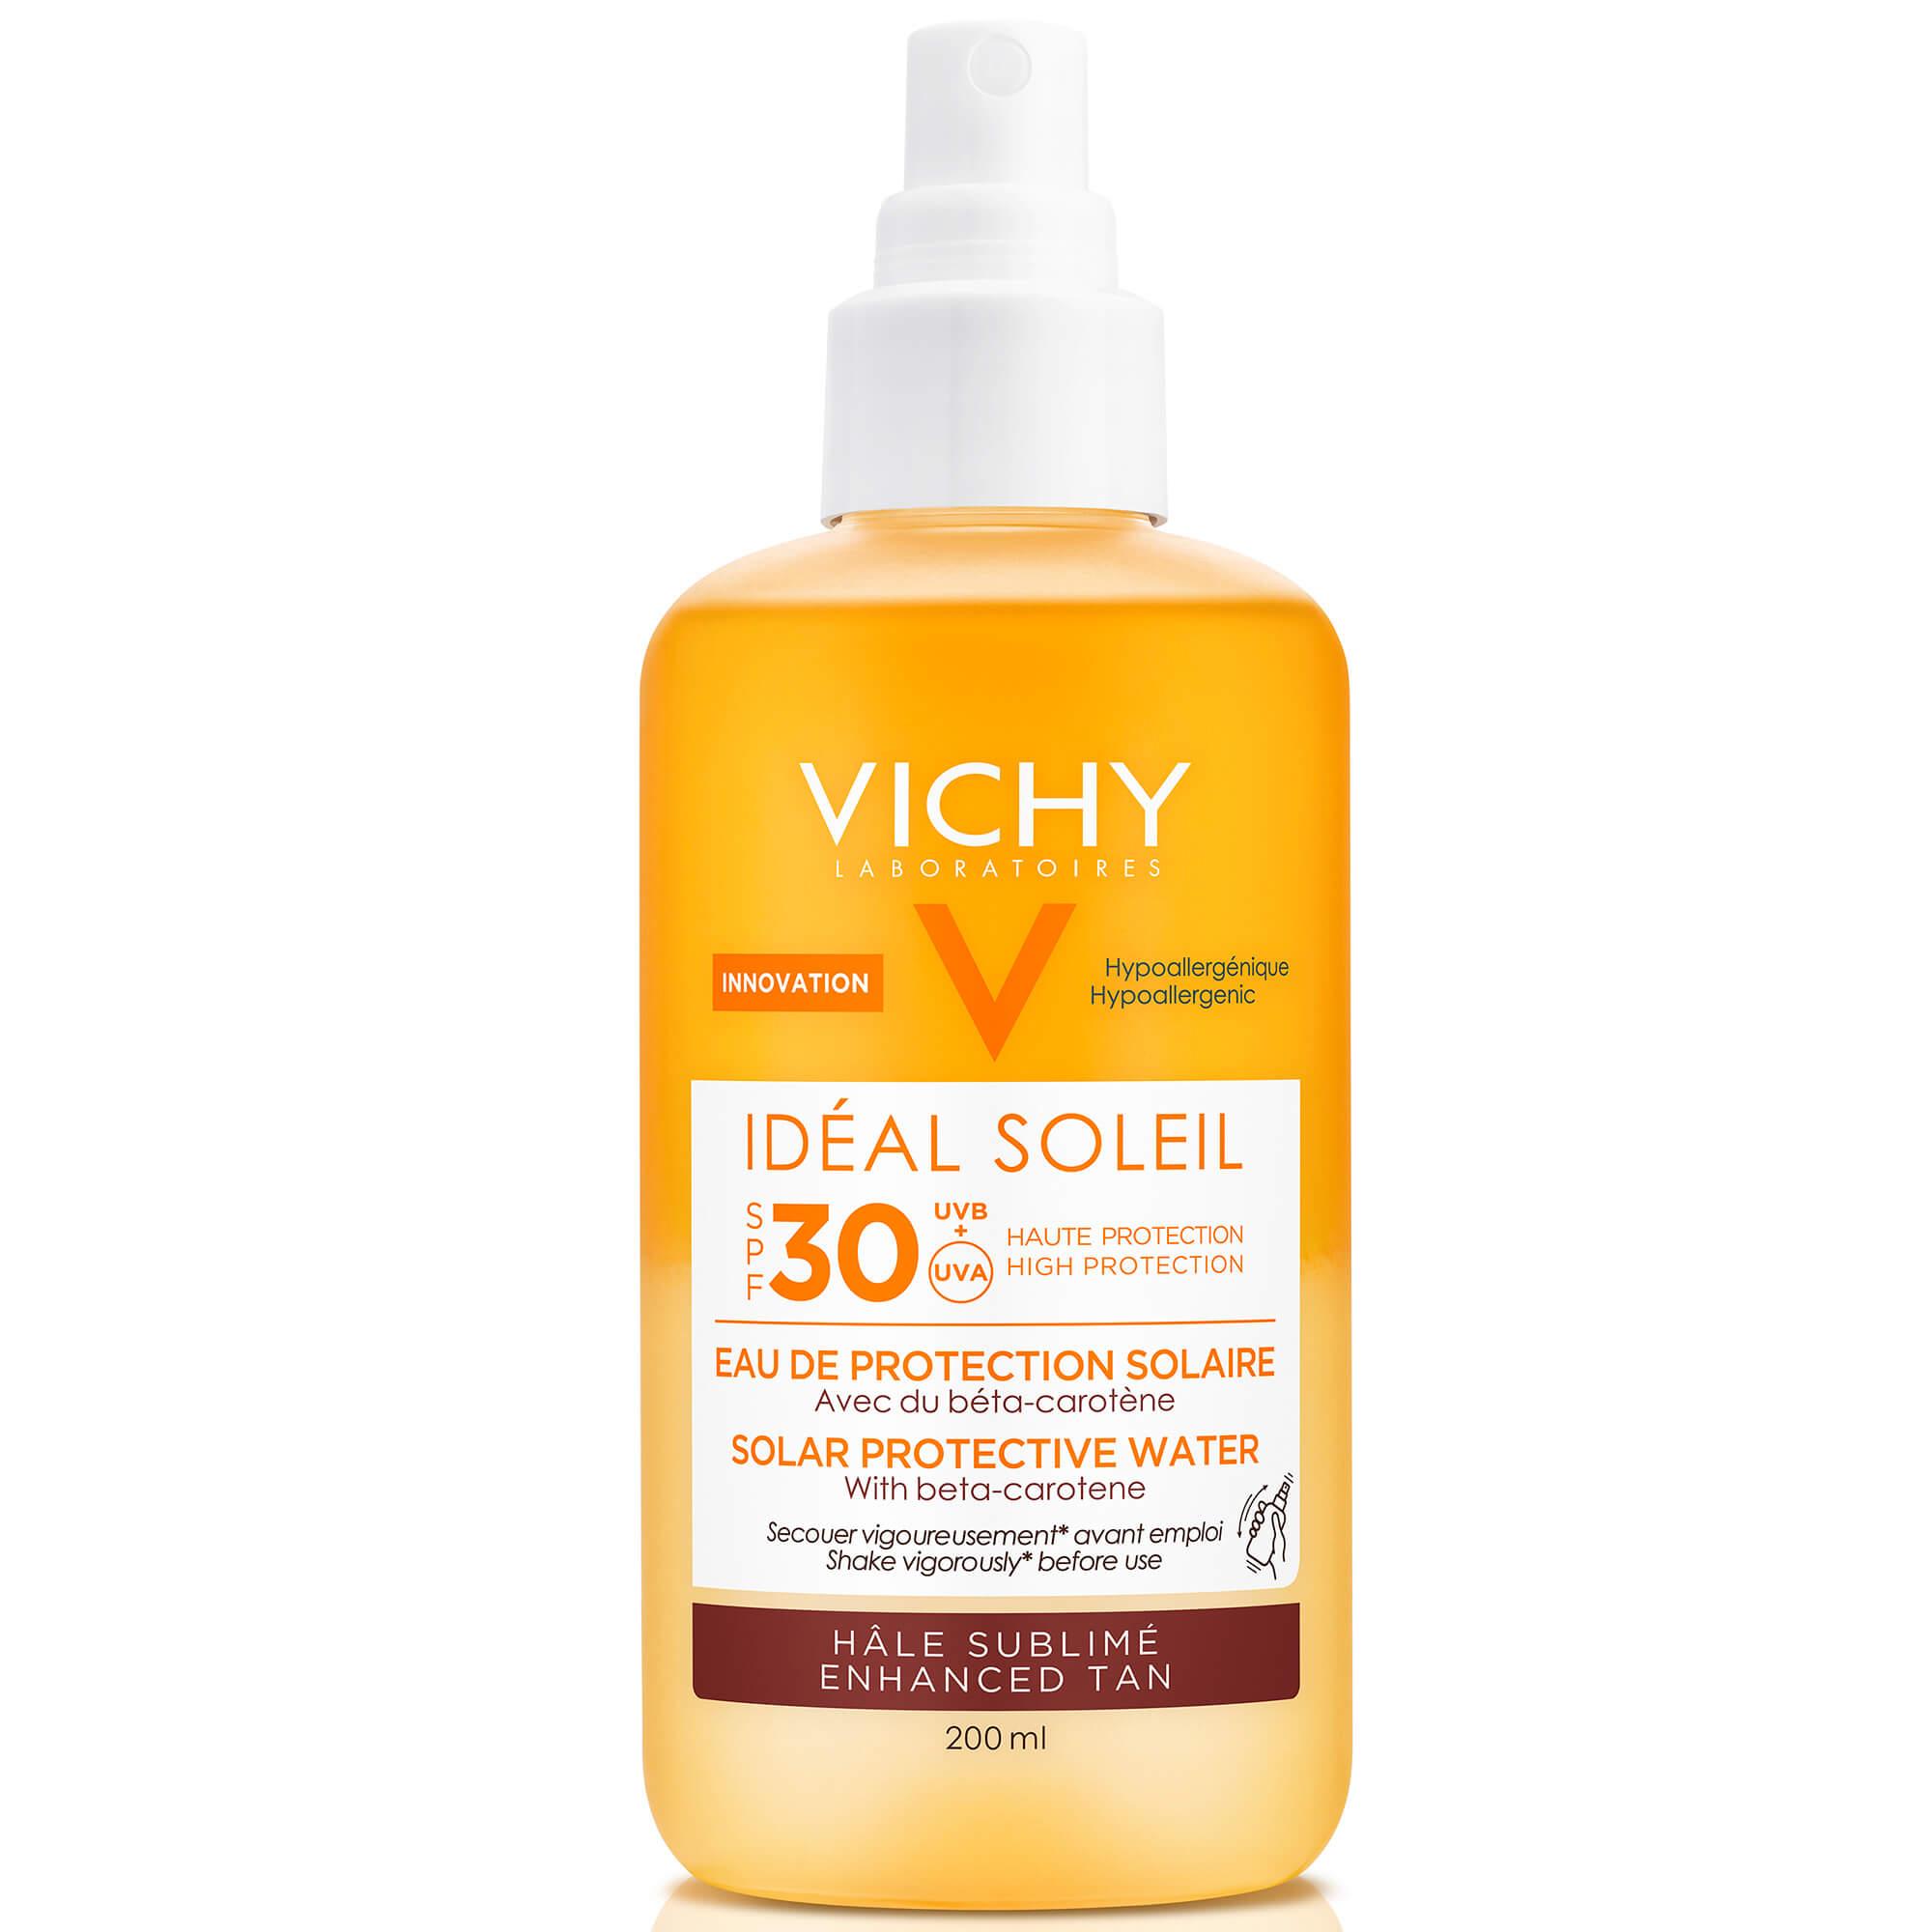 Vichy Ideal Soleil Spf30 Νερό Υψηλής Προστασίας από τον Ήλιο με Βήτα Καροτίνη για Λαμπερό Μαύρισμα 200ml